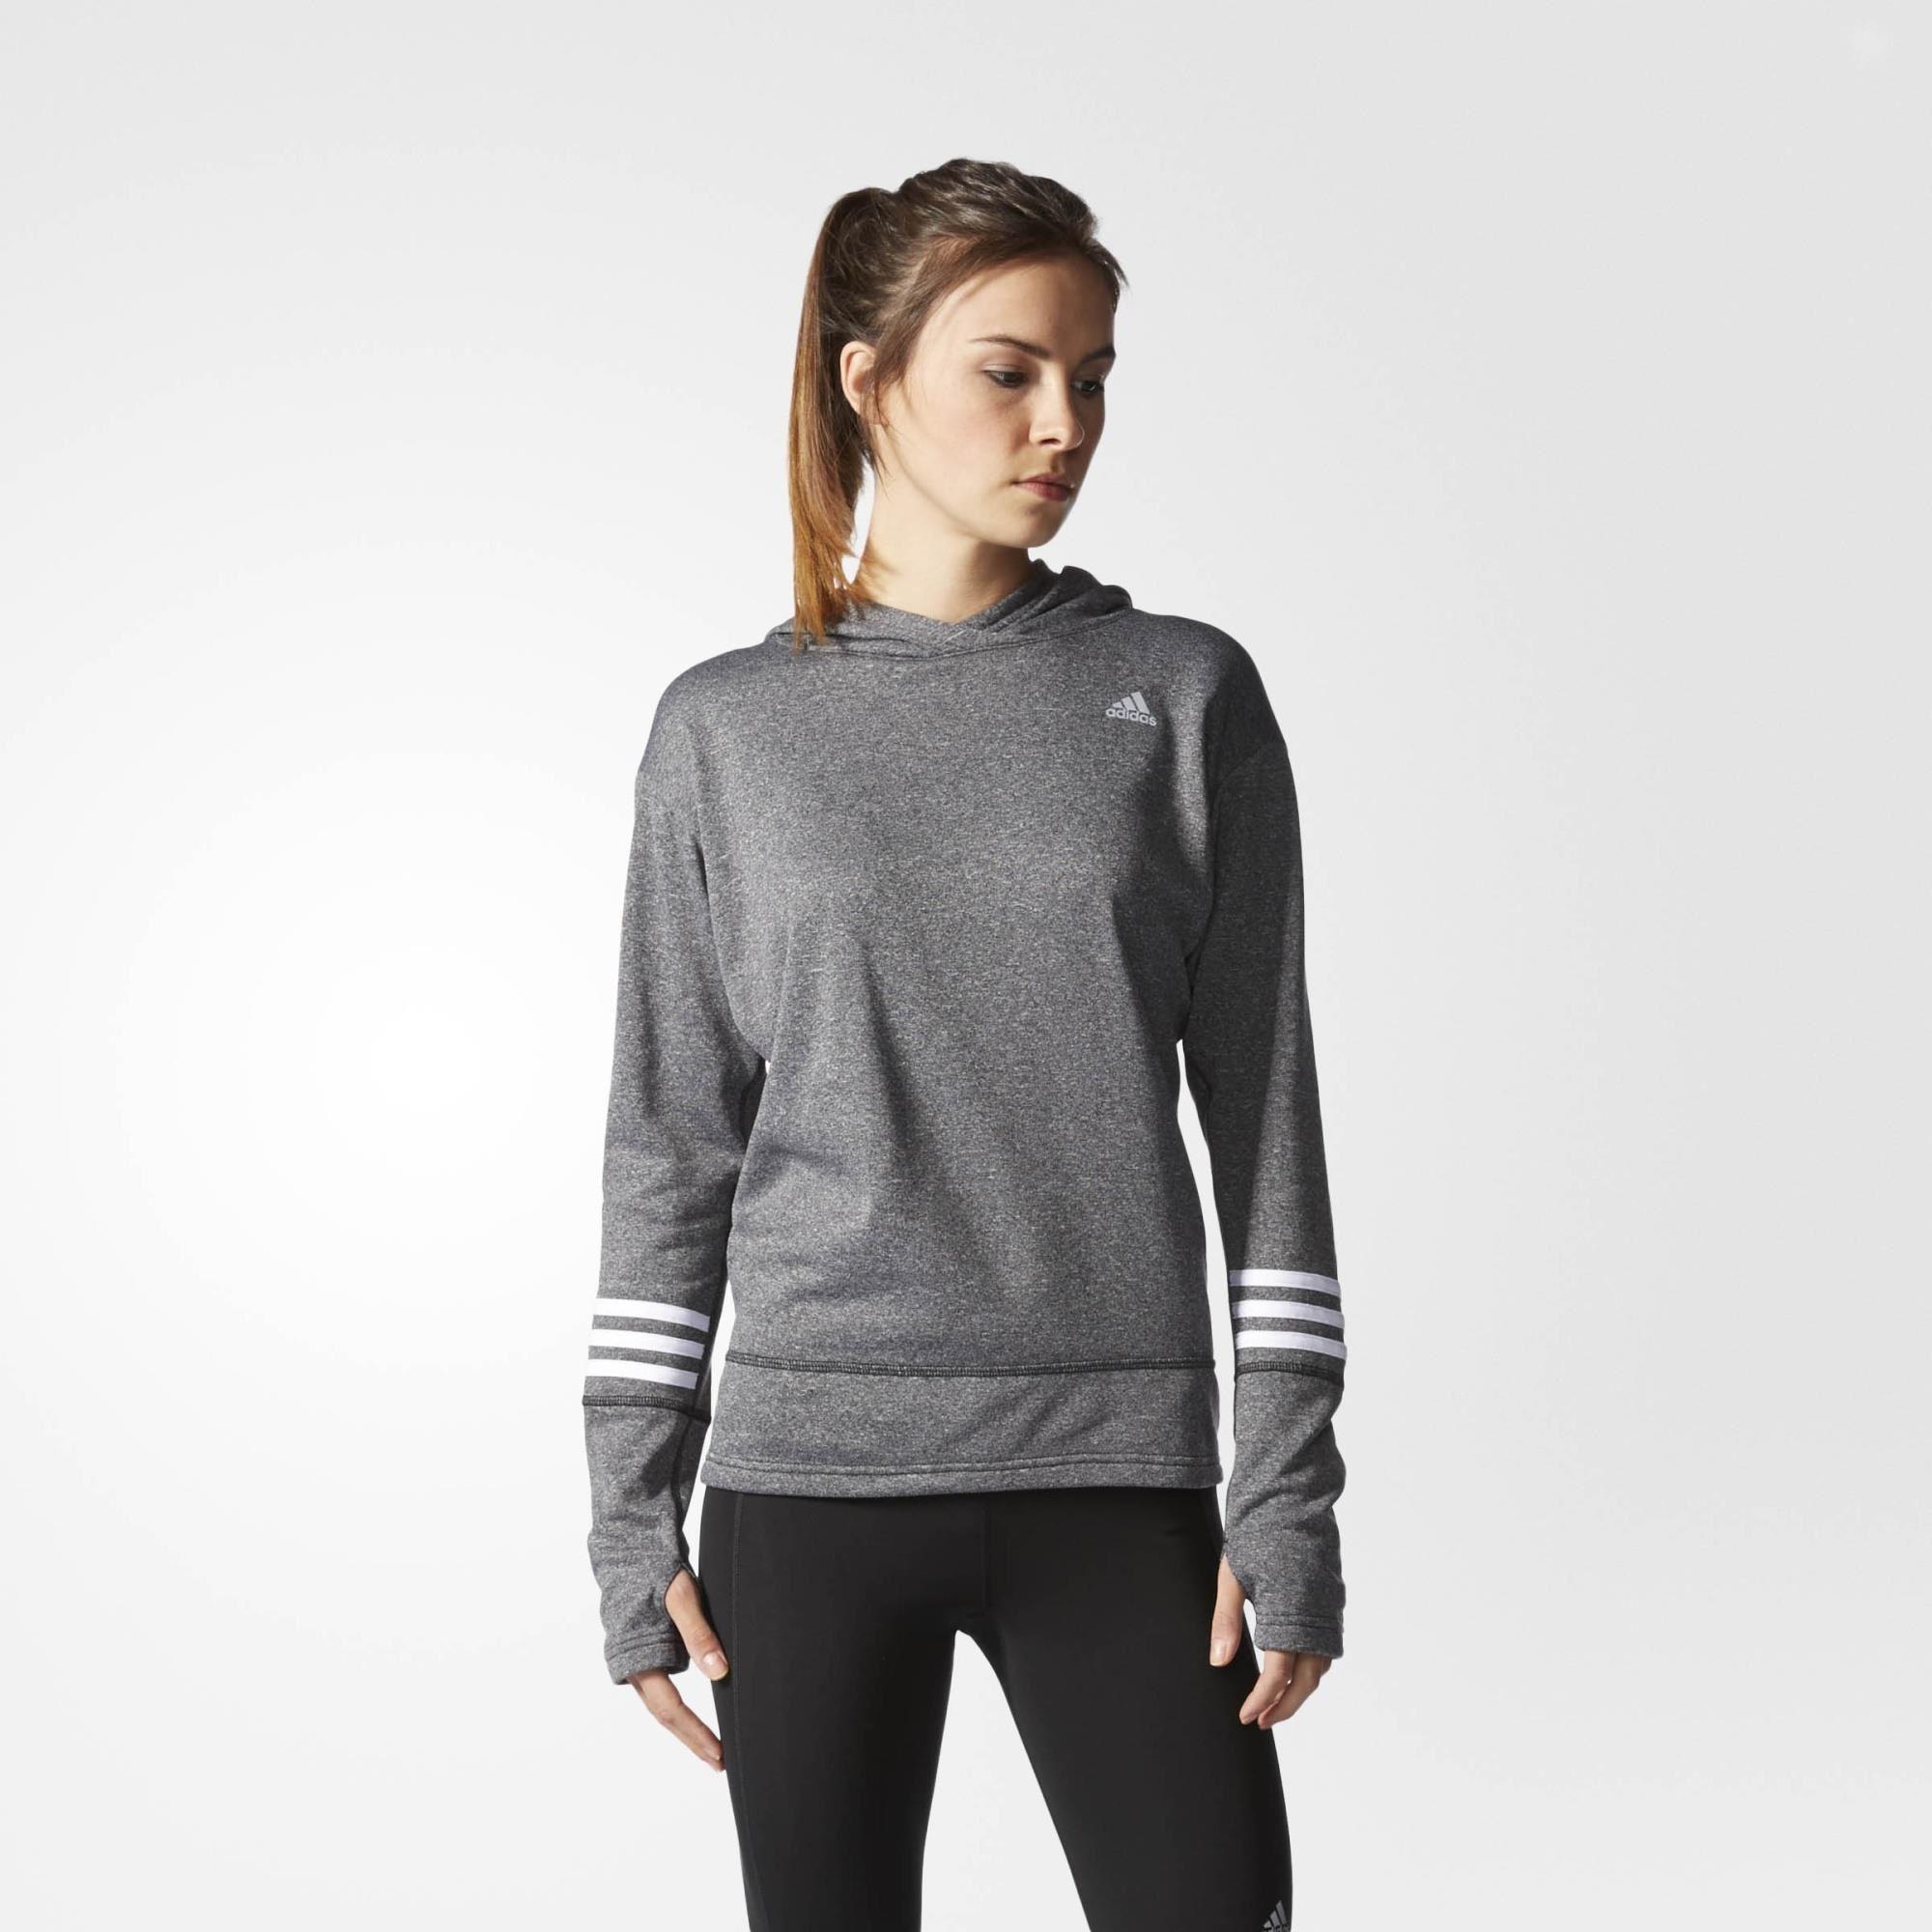 Adidas Women's Response Icon Hoodie sweatshirt